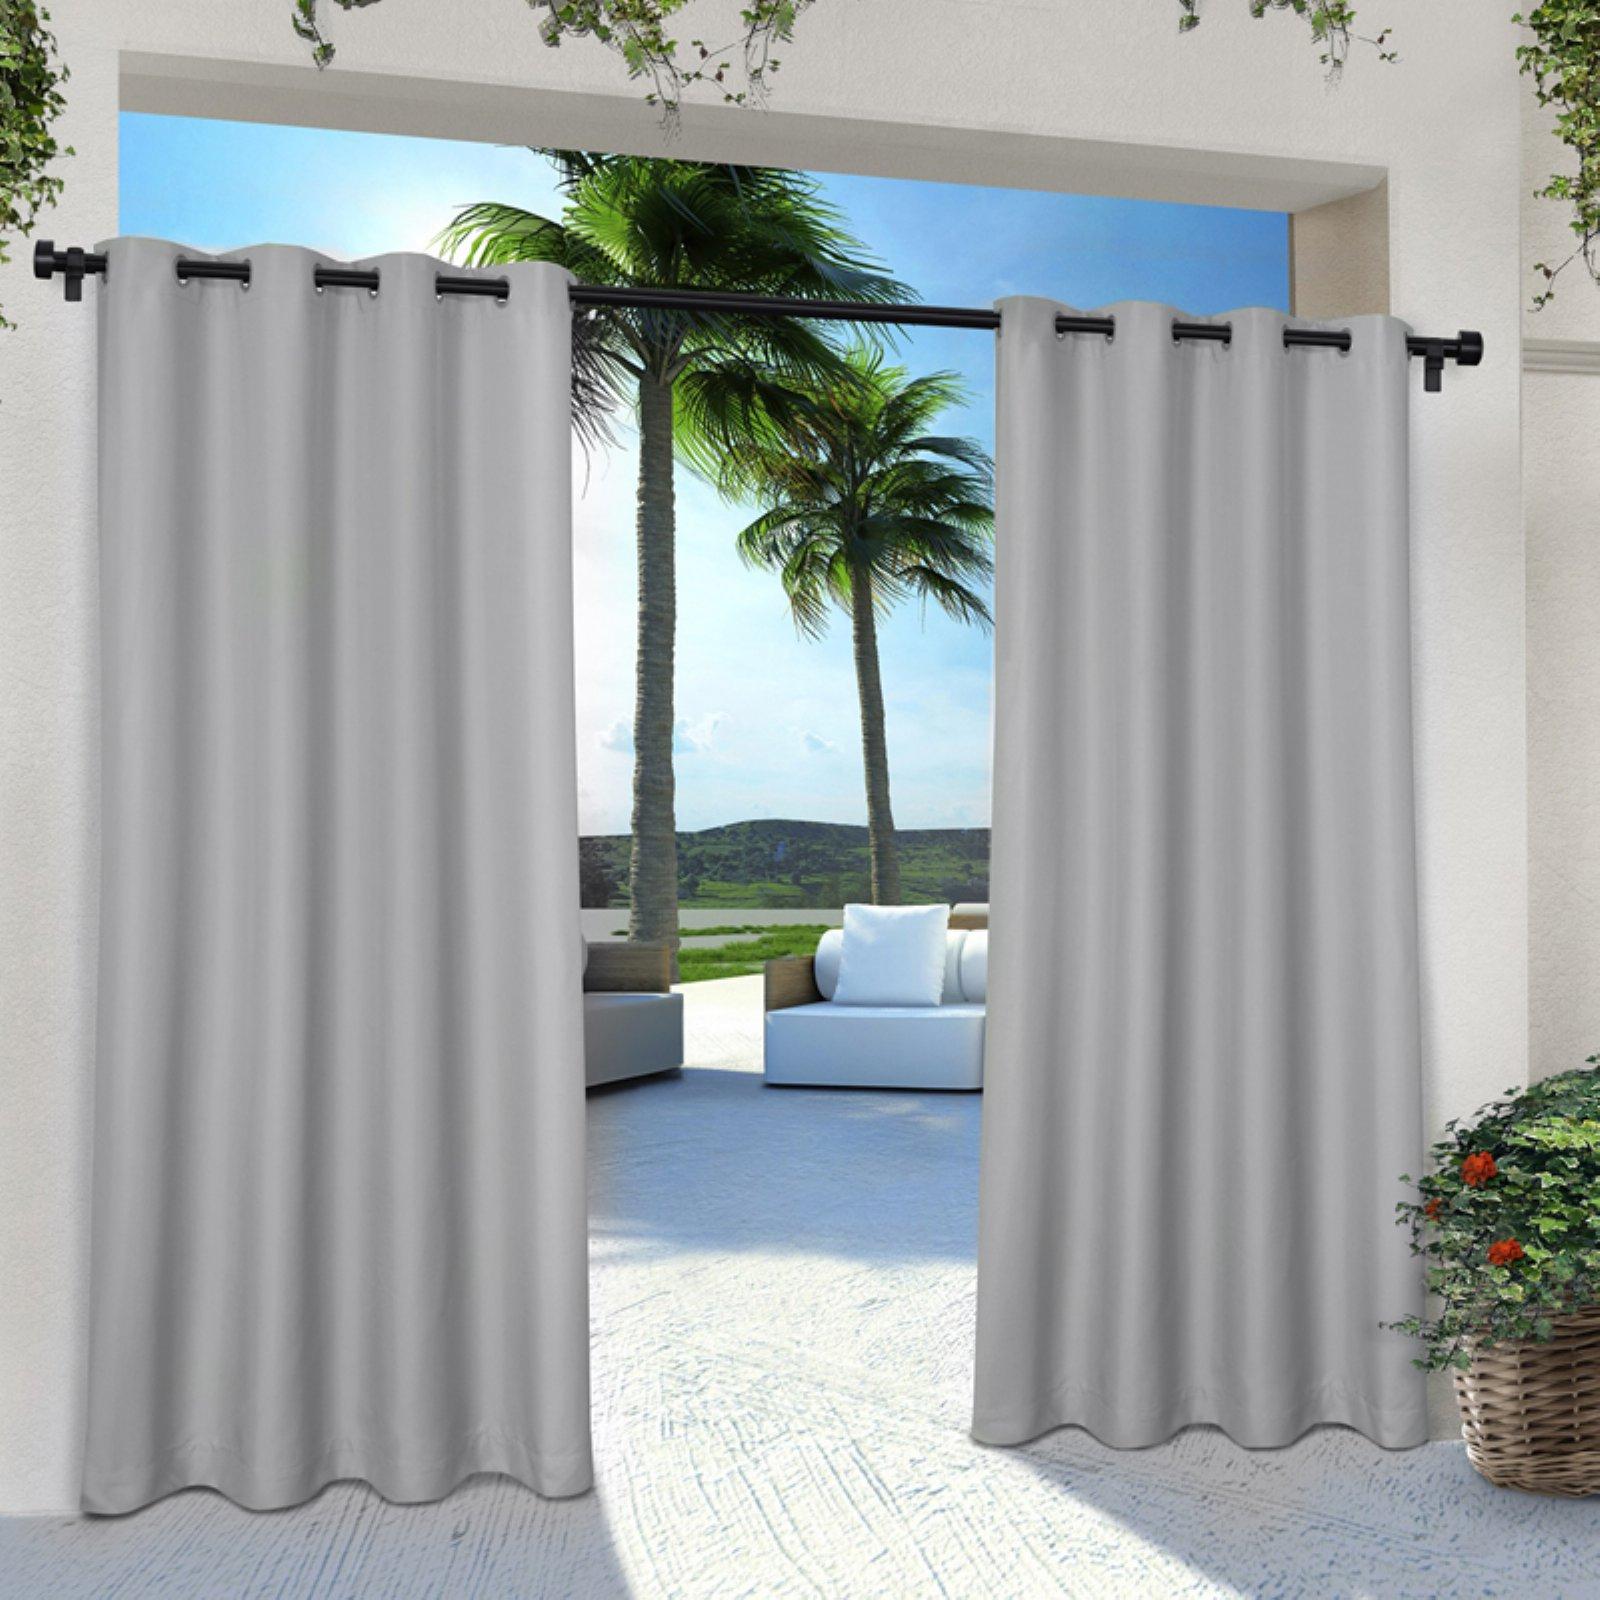 Exclusive Home Cabana Solid Grommet Indoor/outdoor Curtain With Regard To Valencia Cabana Stripe Indoor/outdoor Curtain Panels (View 11 of 30)